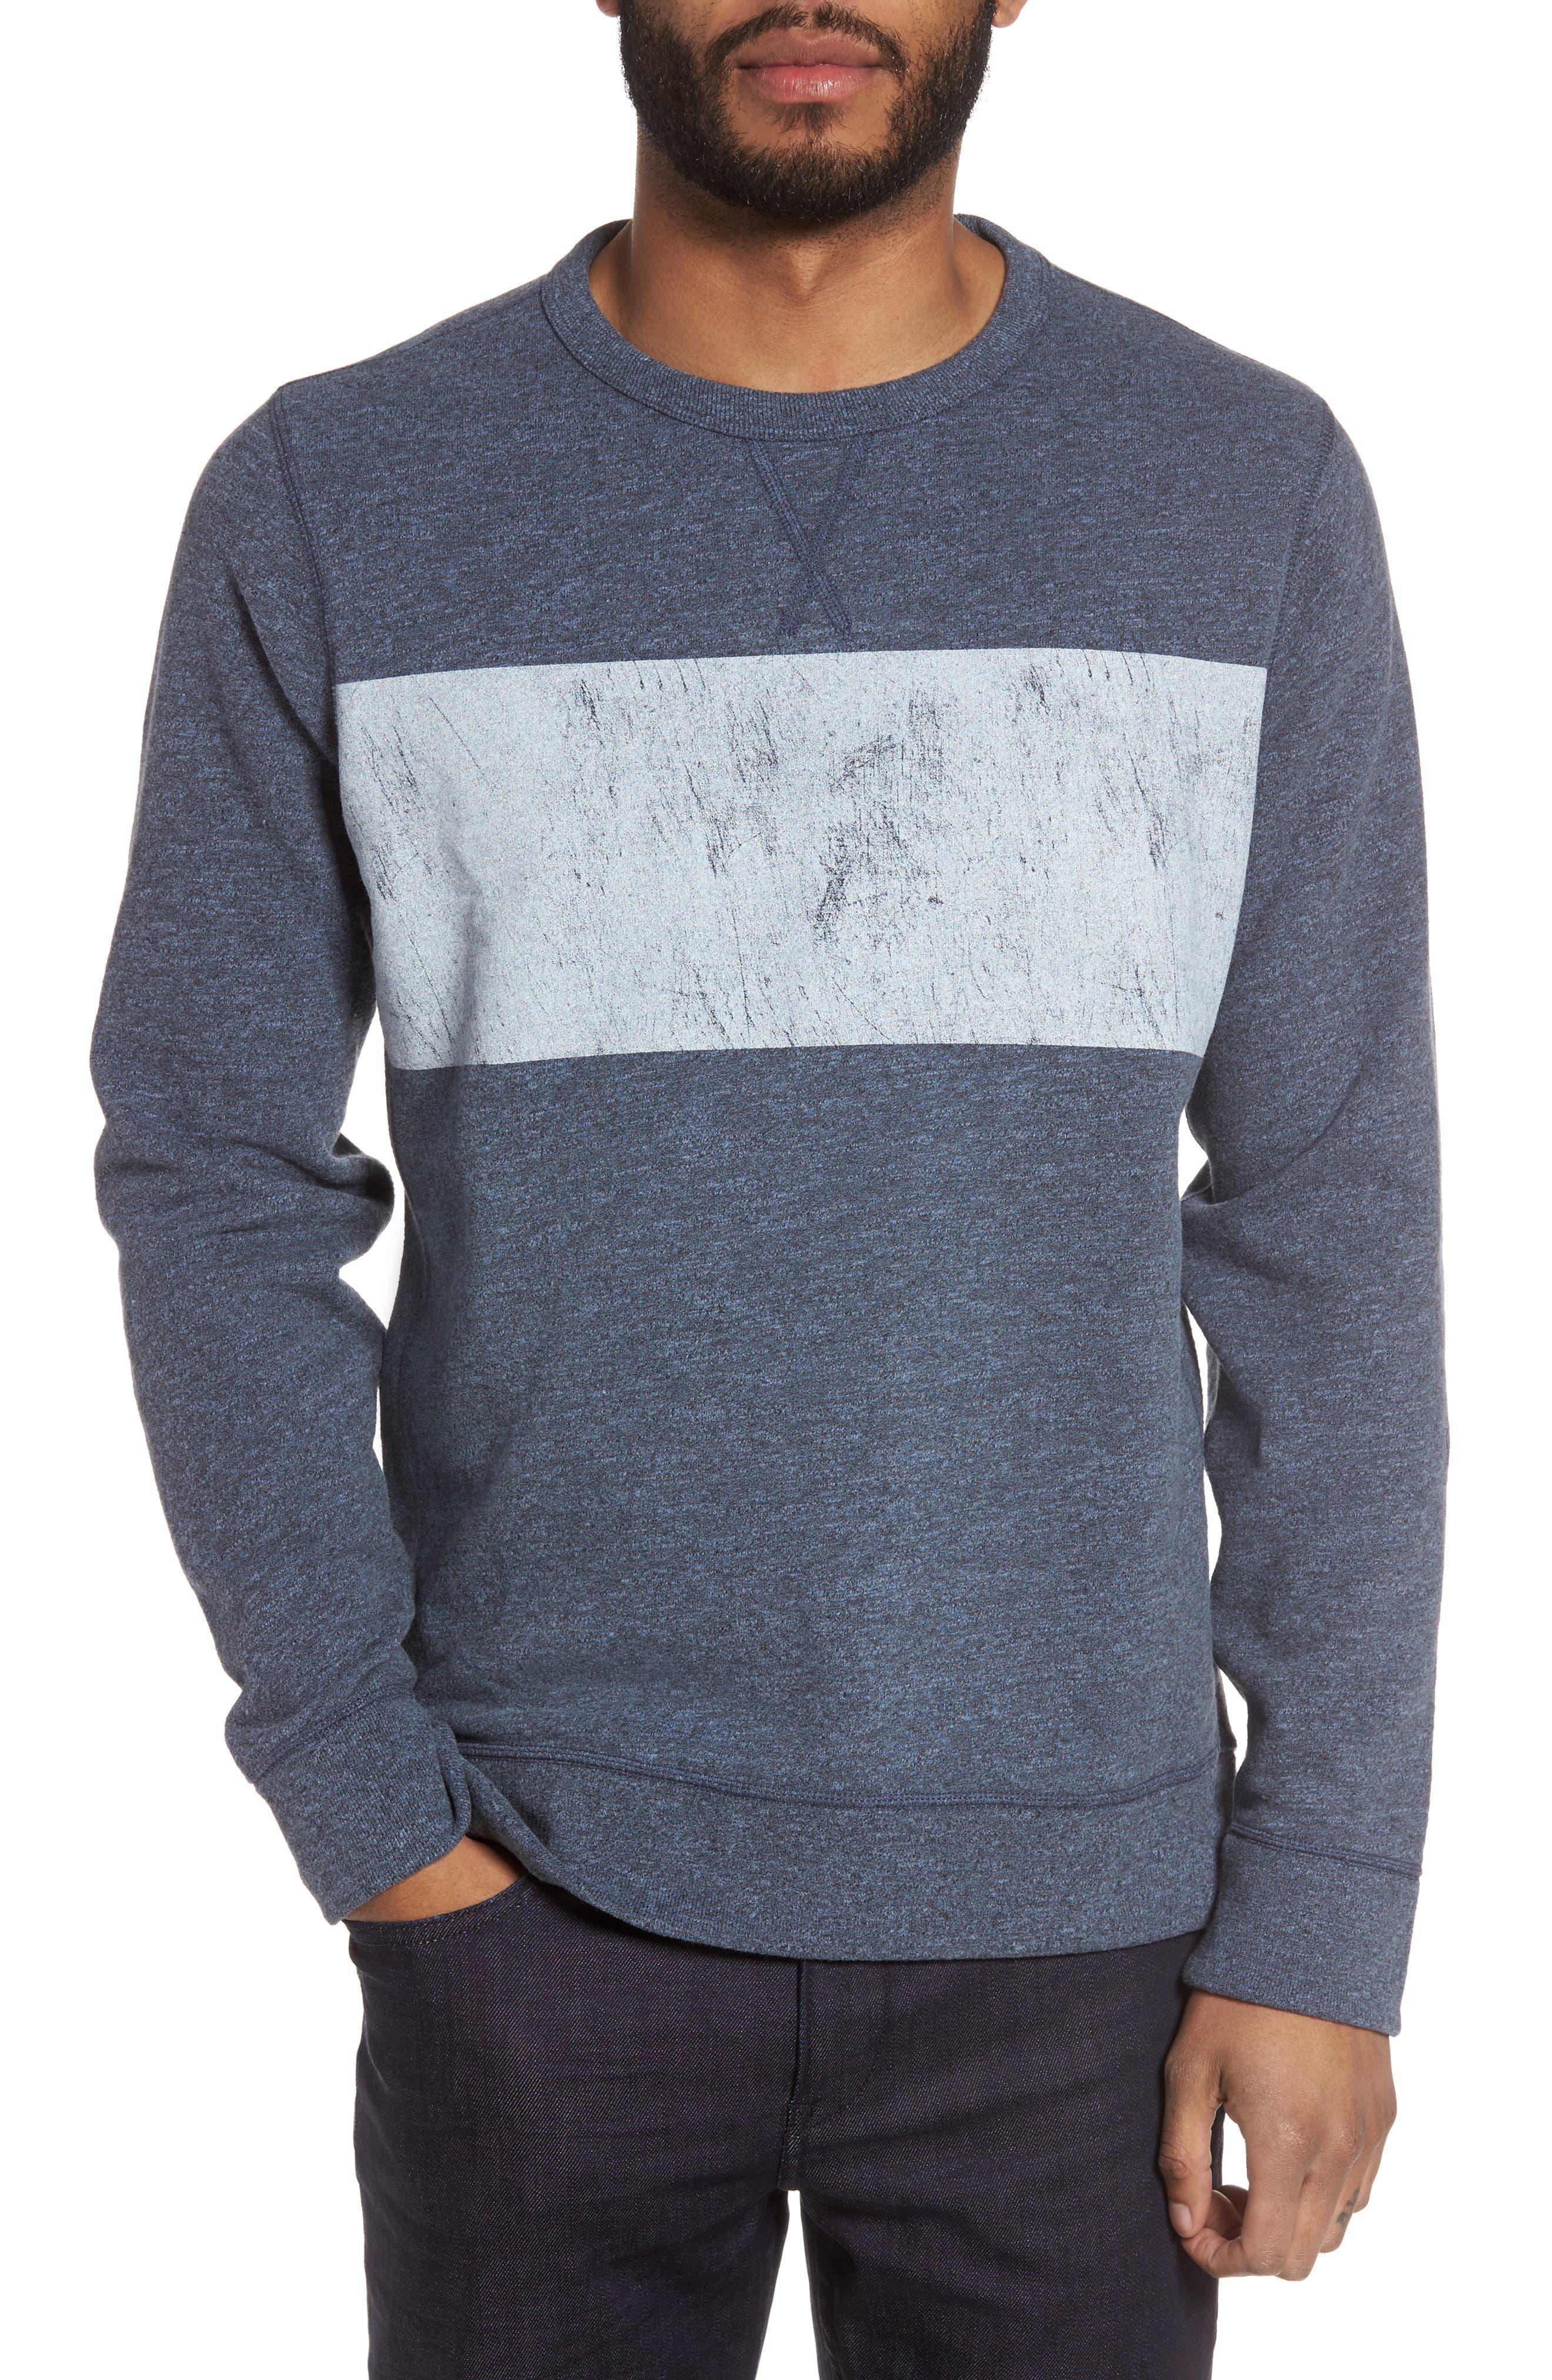 Jason Scott Distressed Print Sweatshirt